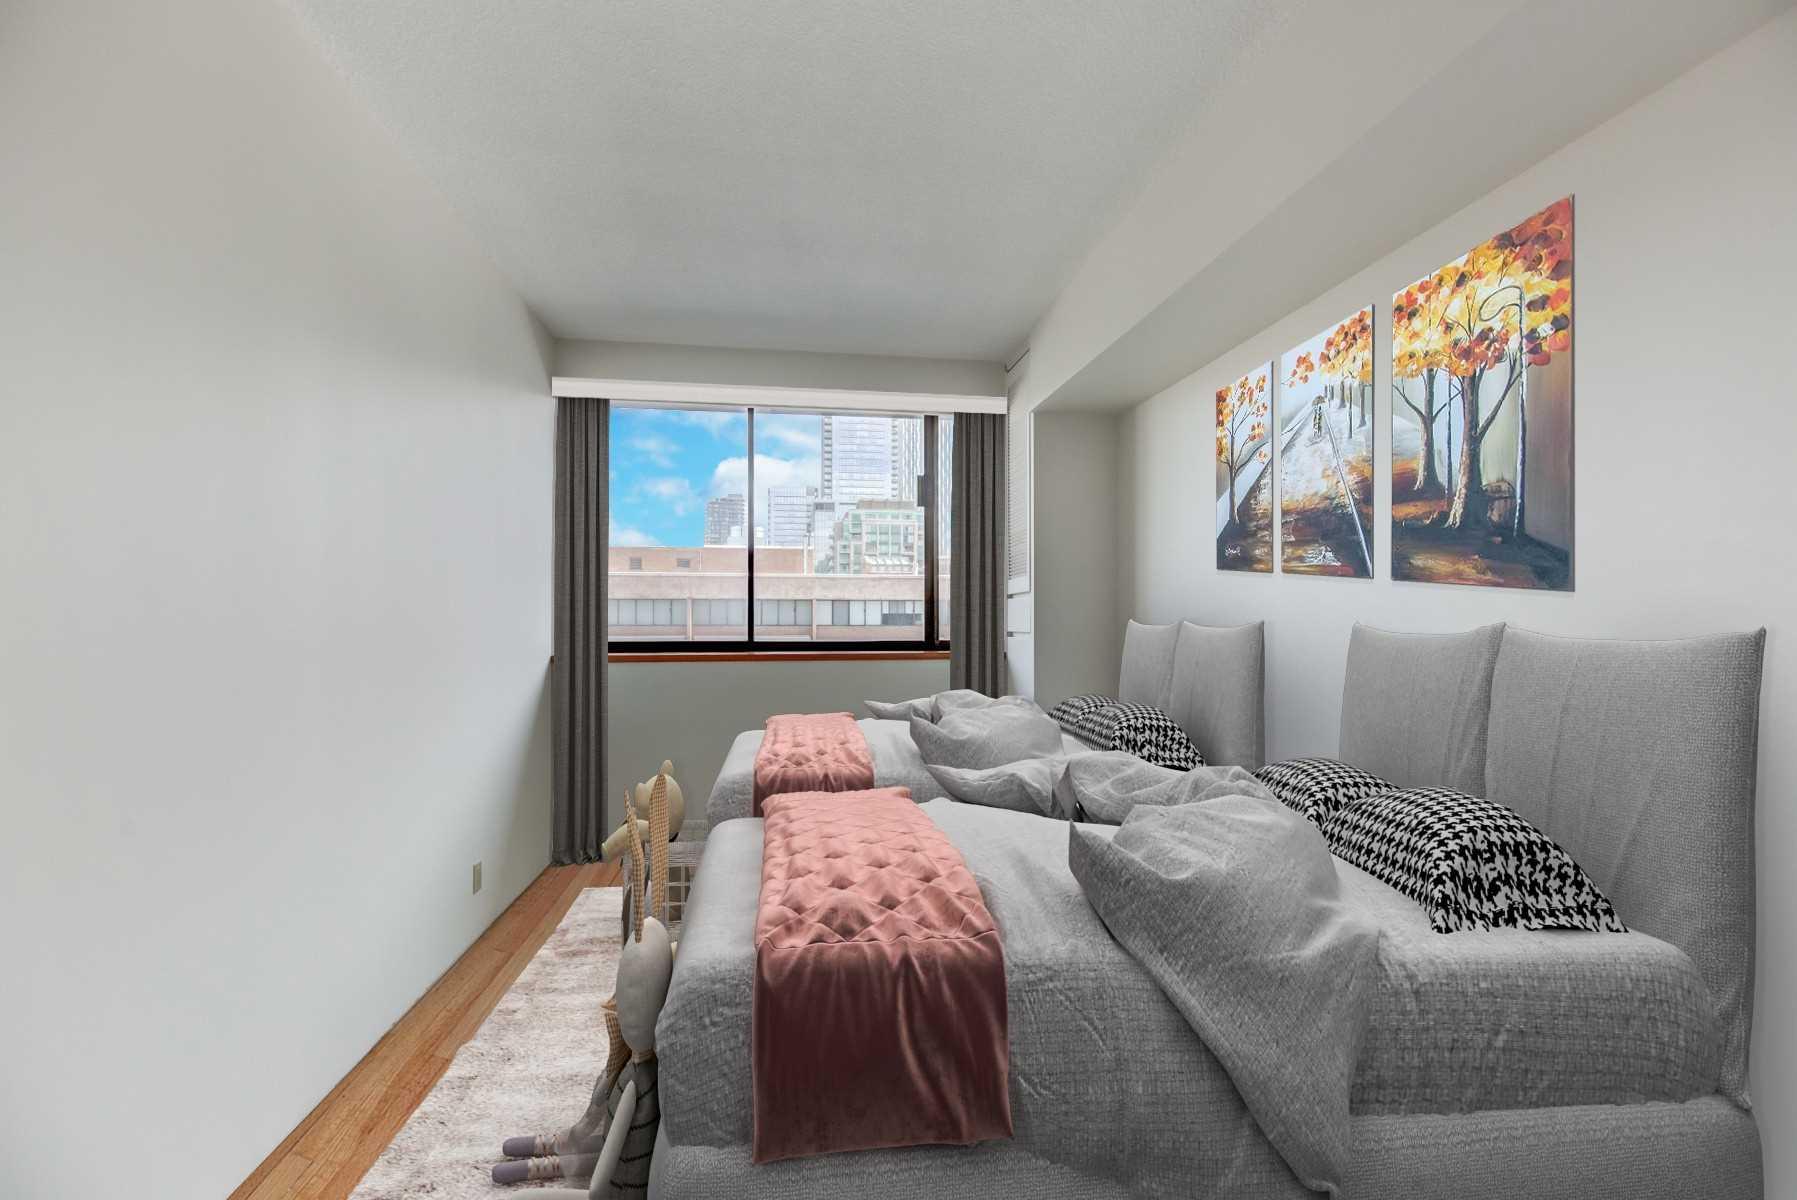 607 - 55A Avenue Rd - Annex Condo Apt for sale, 2 Bedrooms (C5185690) - #9